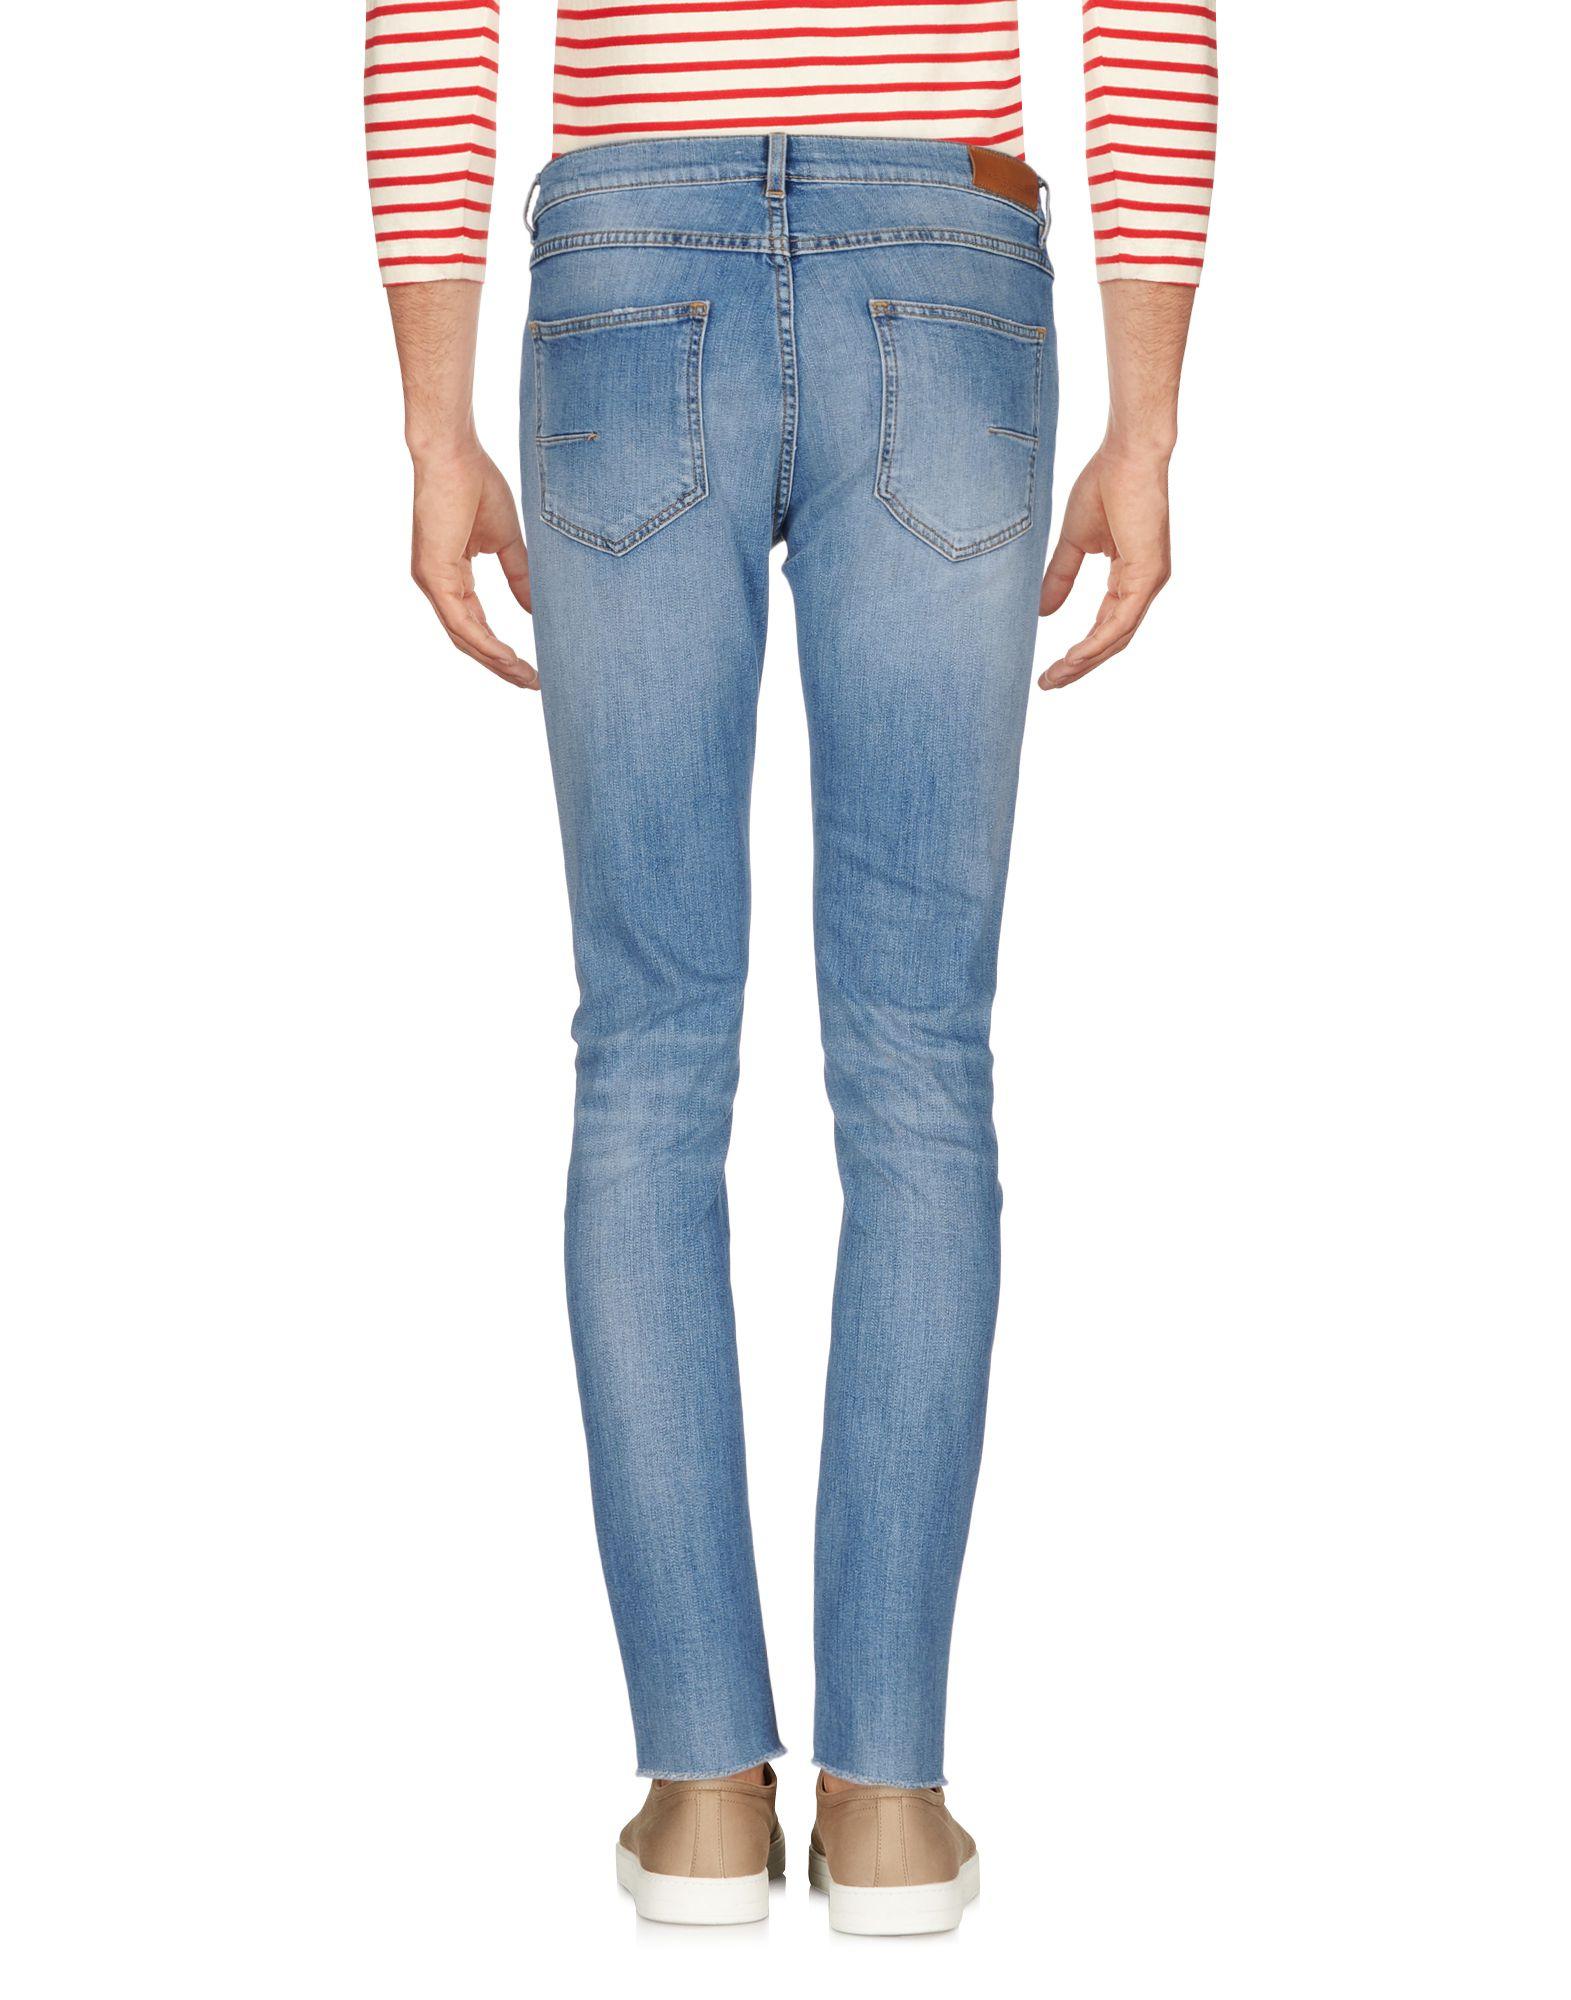 Pantaloni Pecora Jeans Paolo Pecora Pantaloni Uomo - 42637408HA aff879